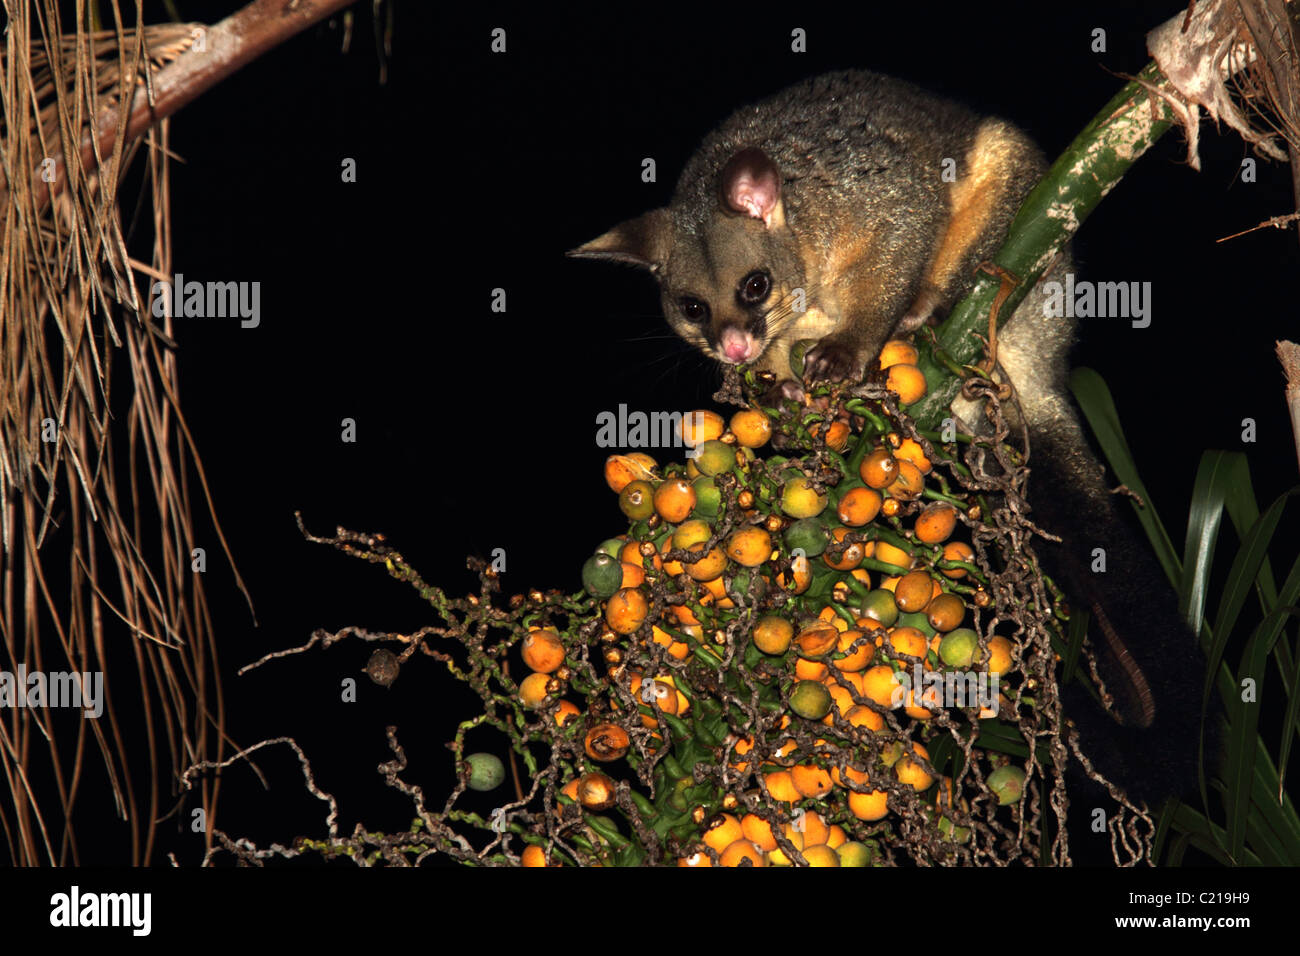 Common brushtail possum eating palm fruit Stock Photo